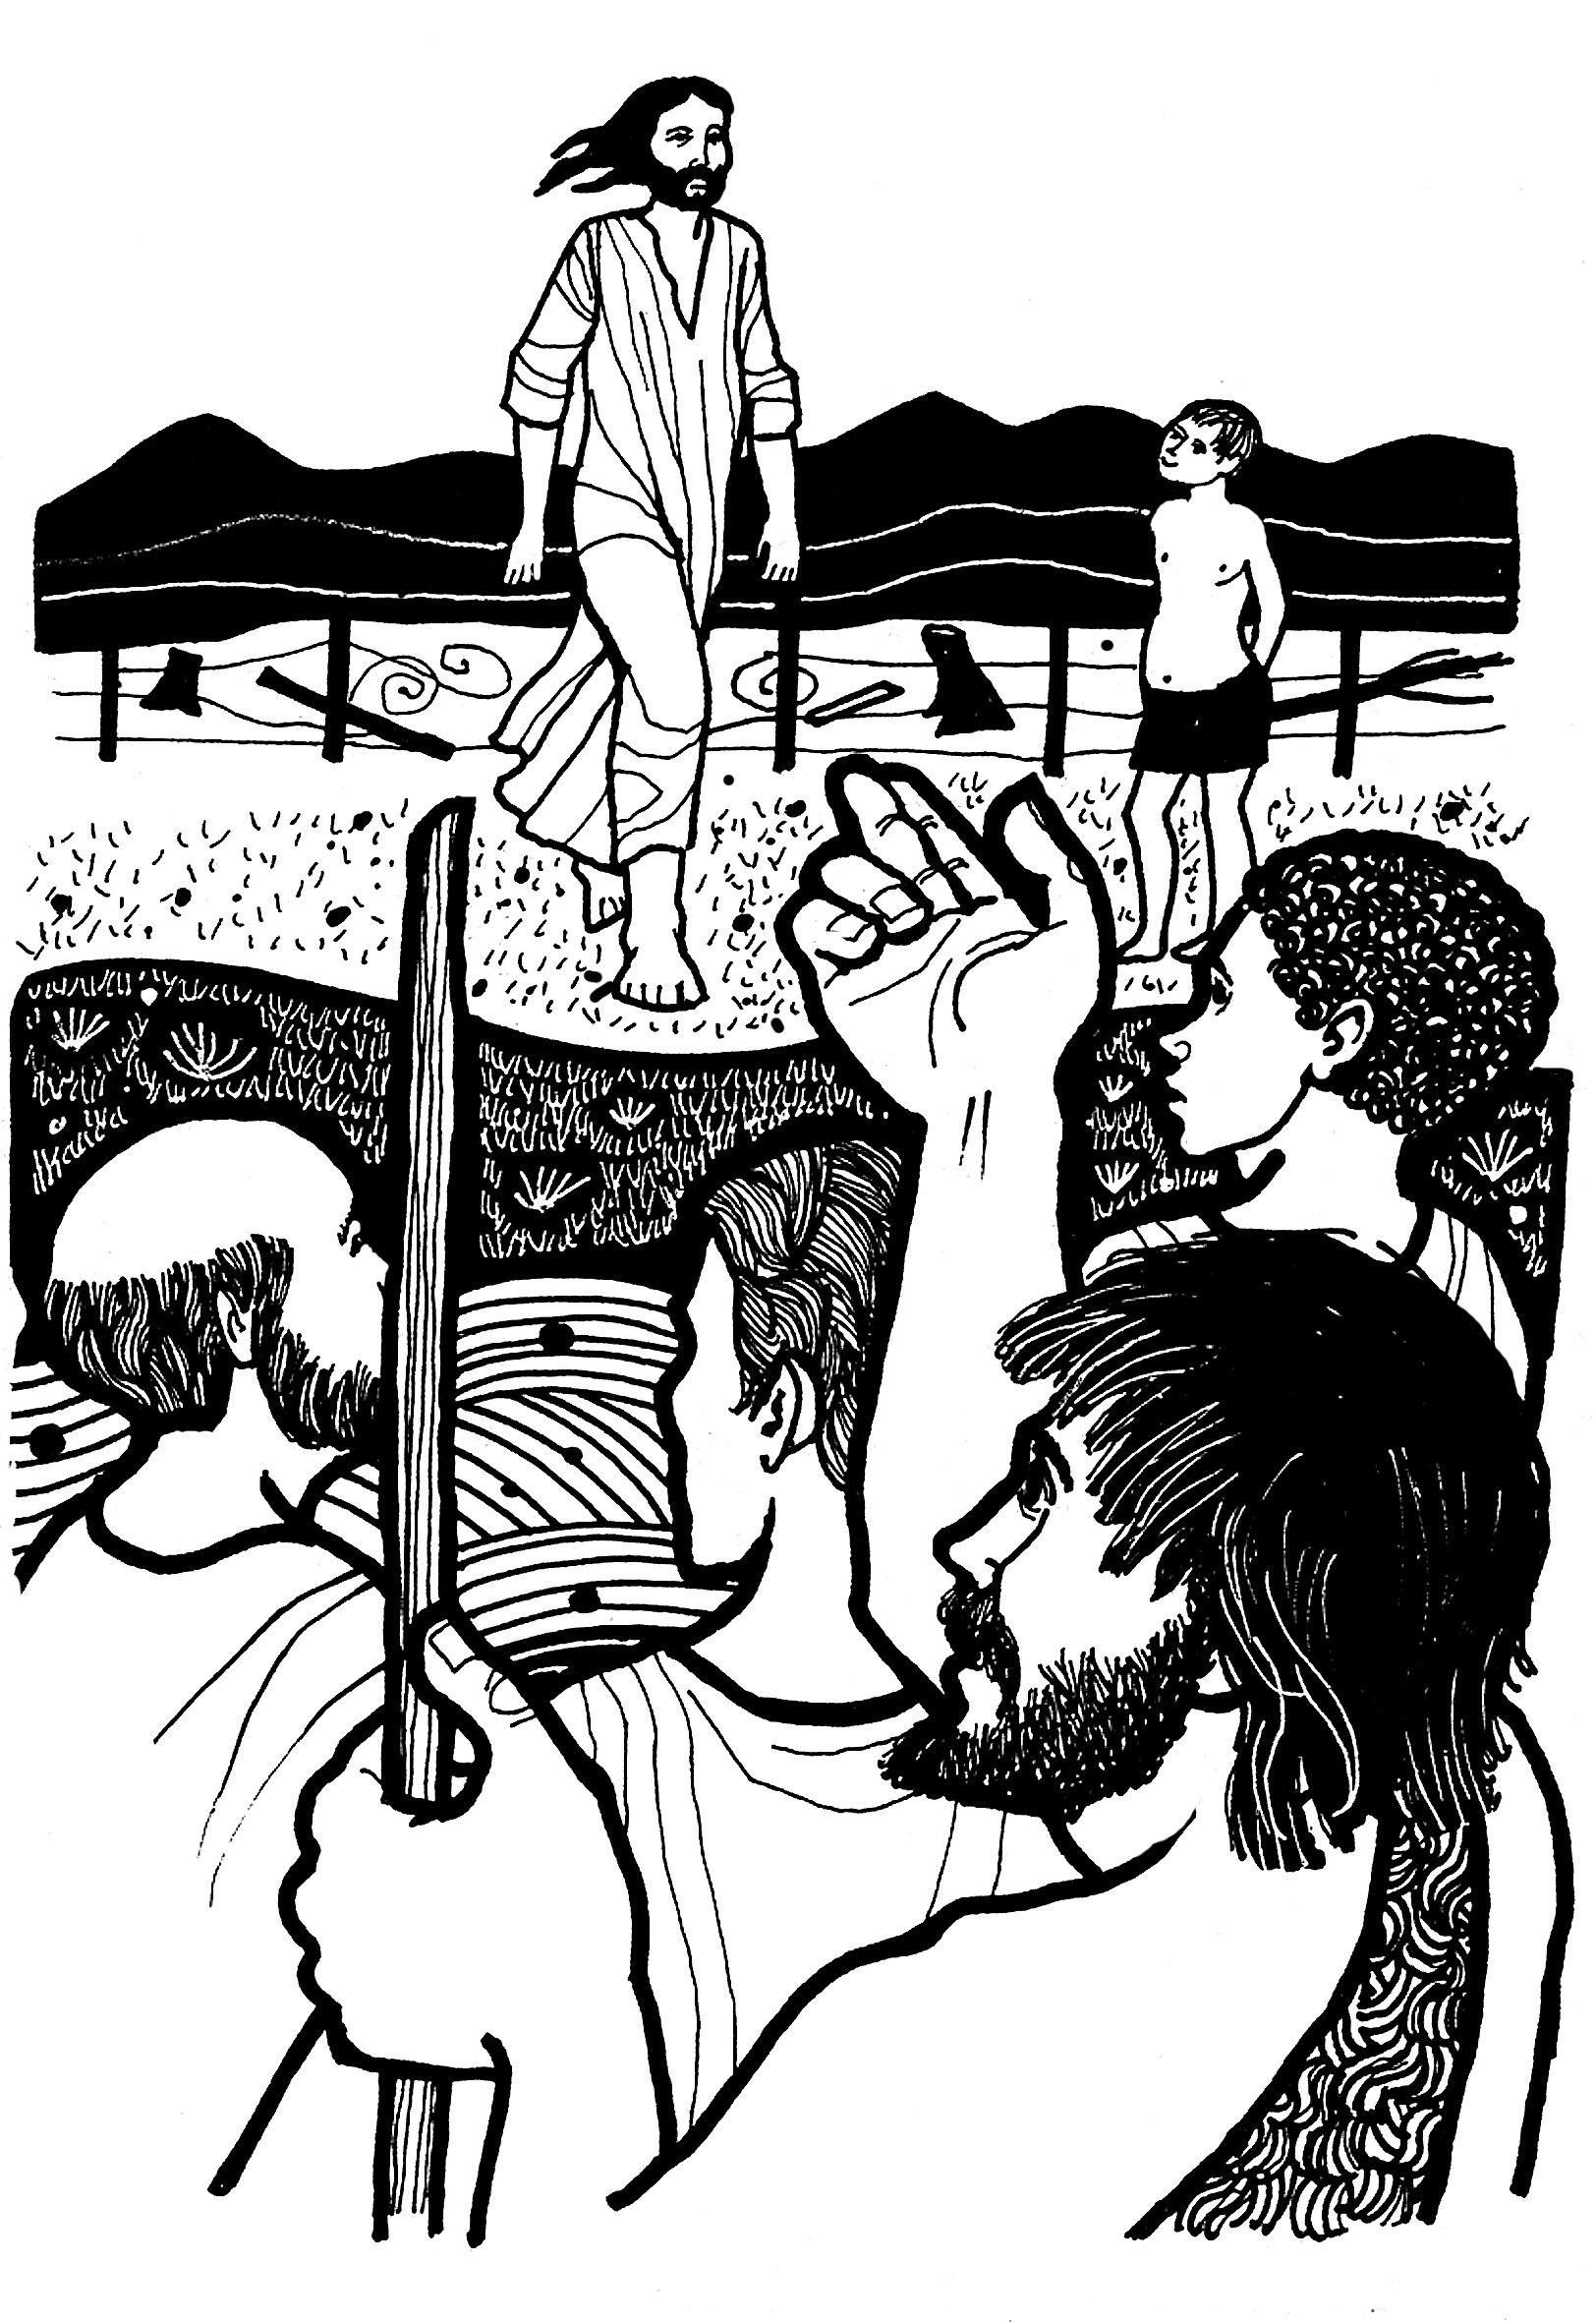 Evangelio Segun San Juan 1 29 34 Del Domingo 15 De